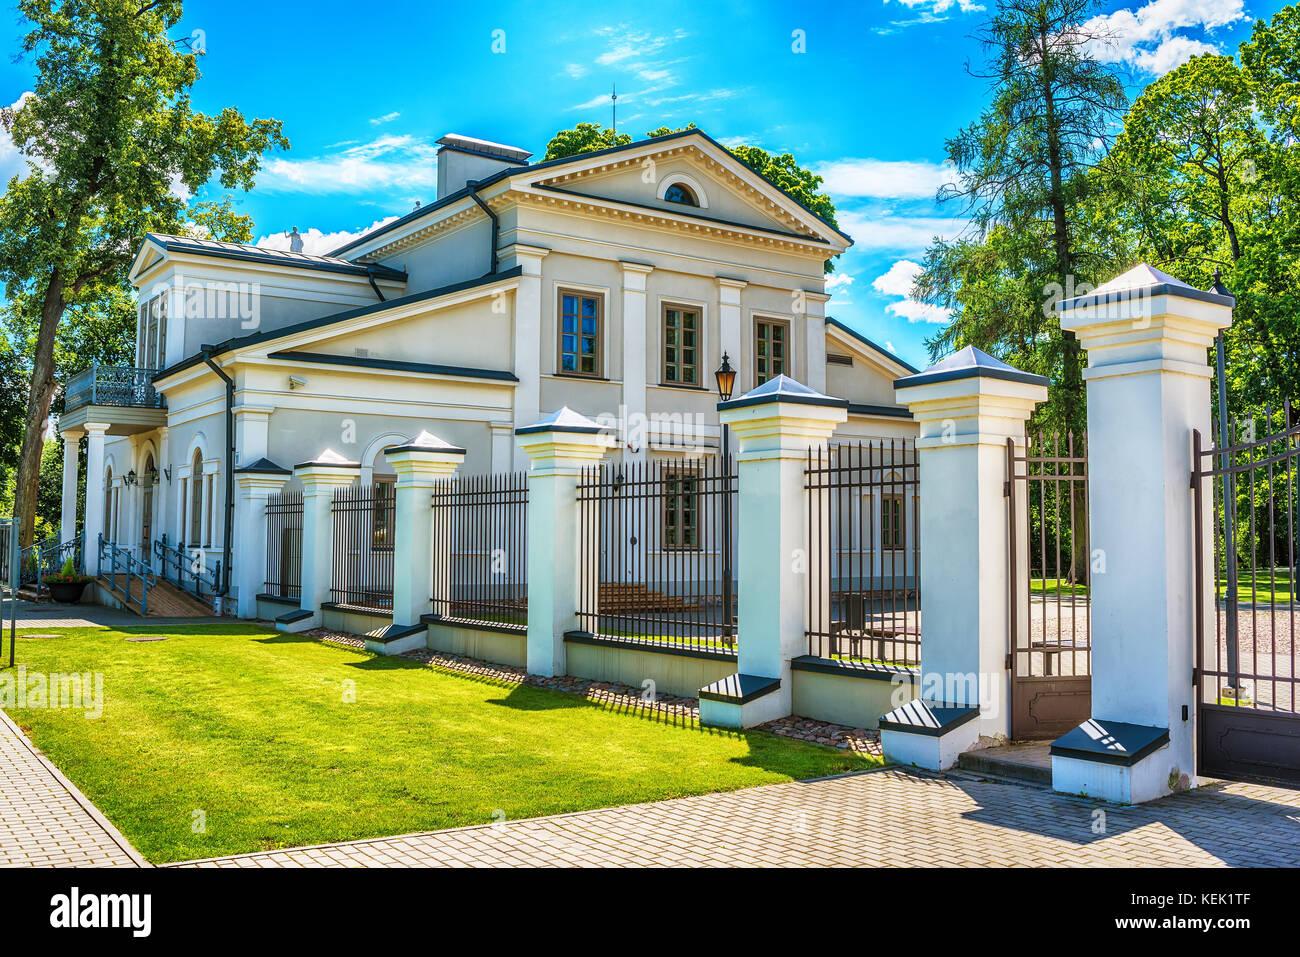 Vilnius, Lithuania: The Memorial Complex of the Tuskulenai Peace Park, where the victims of soviet NKVD-KGB repressions - Stock Image